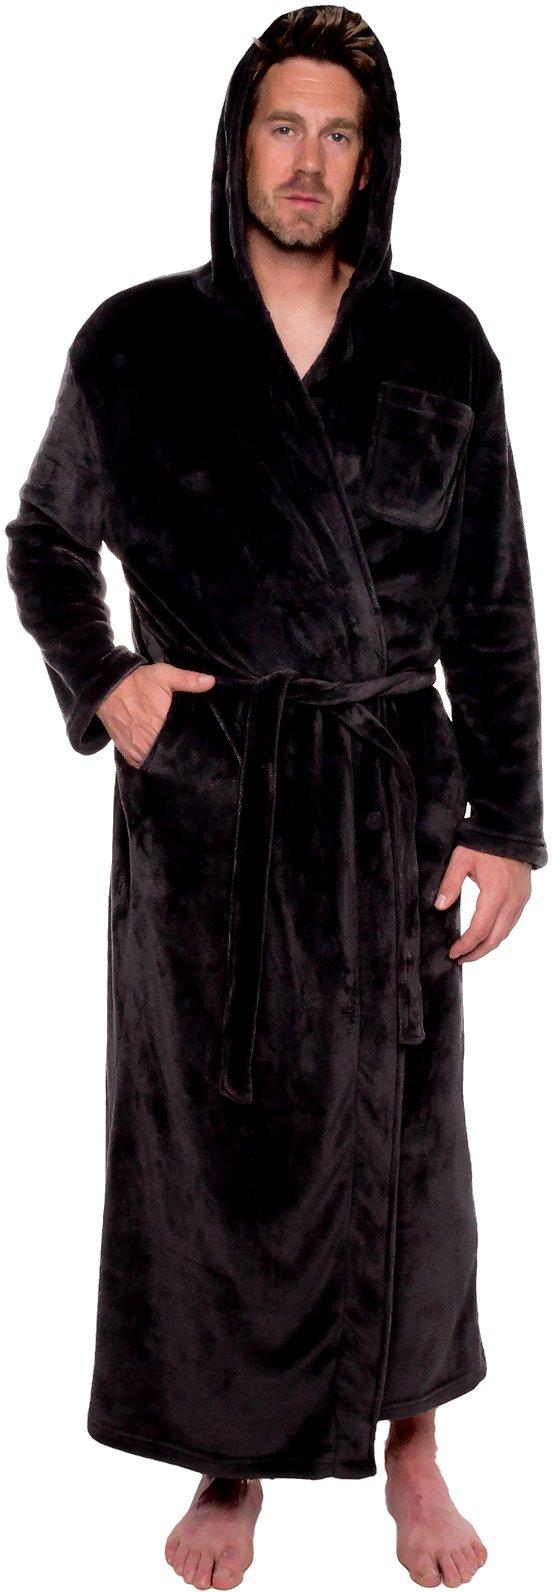 Ross Michaels Mens Hooded Long Robe - Full Length Big & Tall Bathrobe by (Black, L/XL)